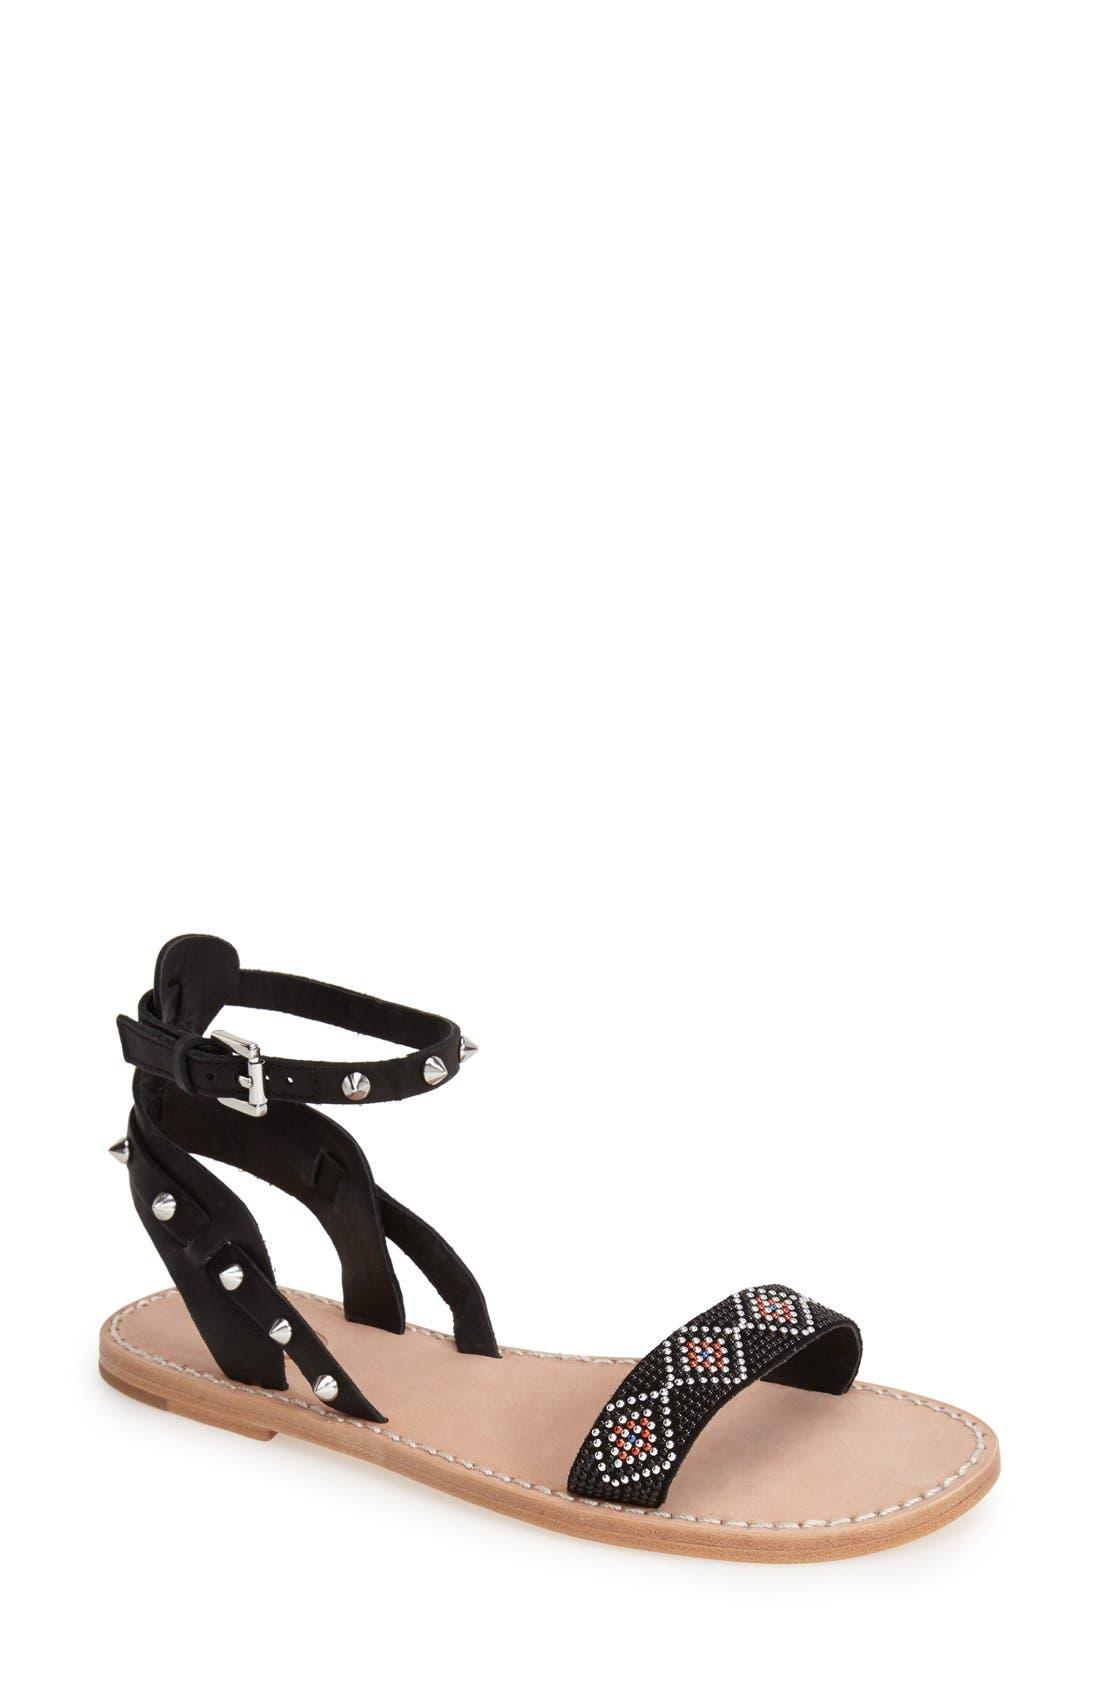 Main Image - Ash 'Pearl' Studded Leather Sandal (Women)